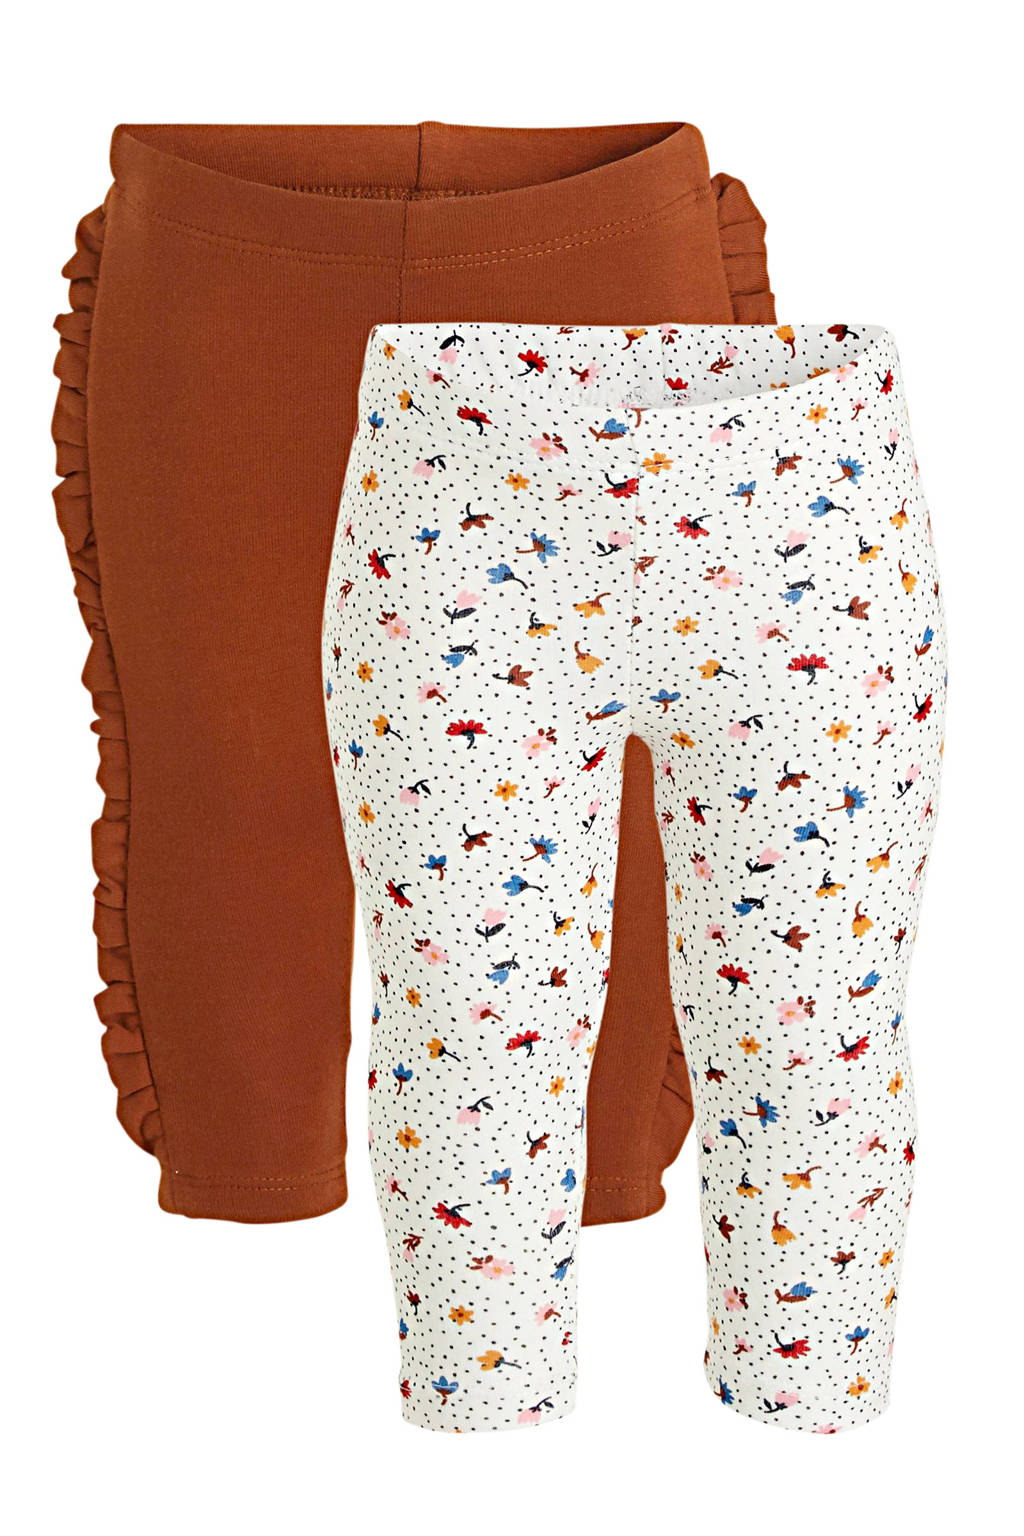 C&A Baby Club legging - set van 2 ecru/roodbruin, Ecru/roodbruin